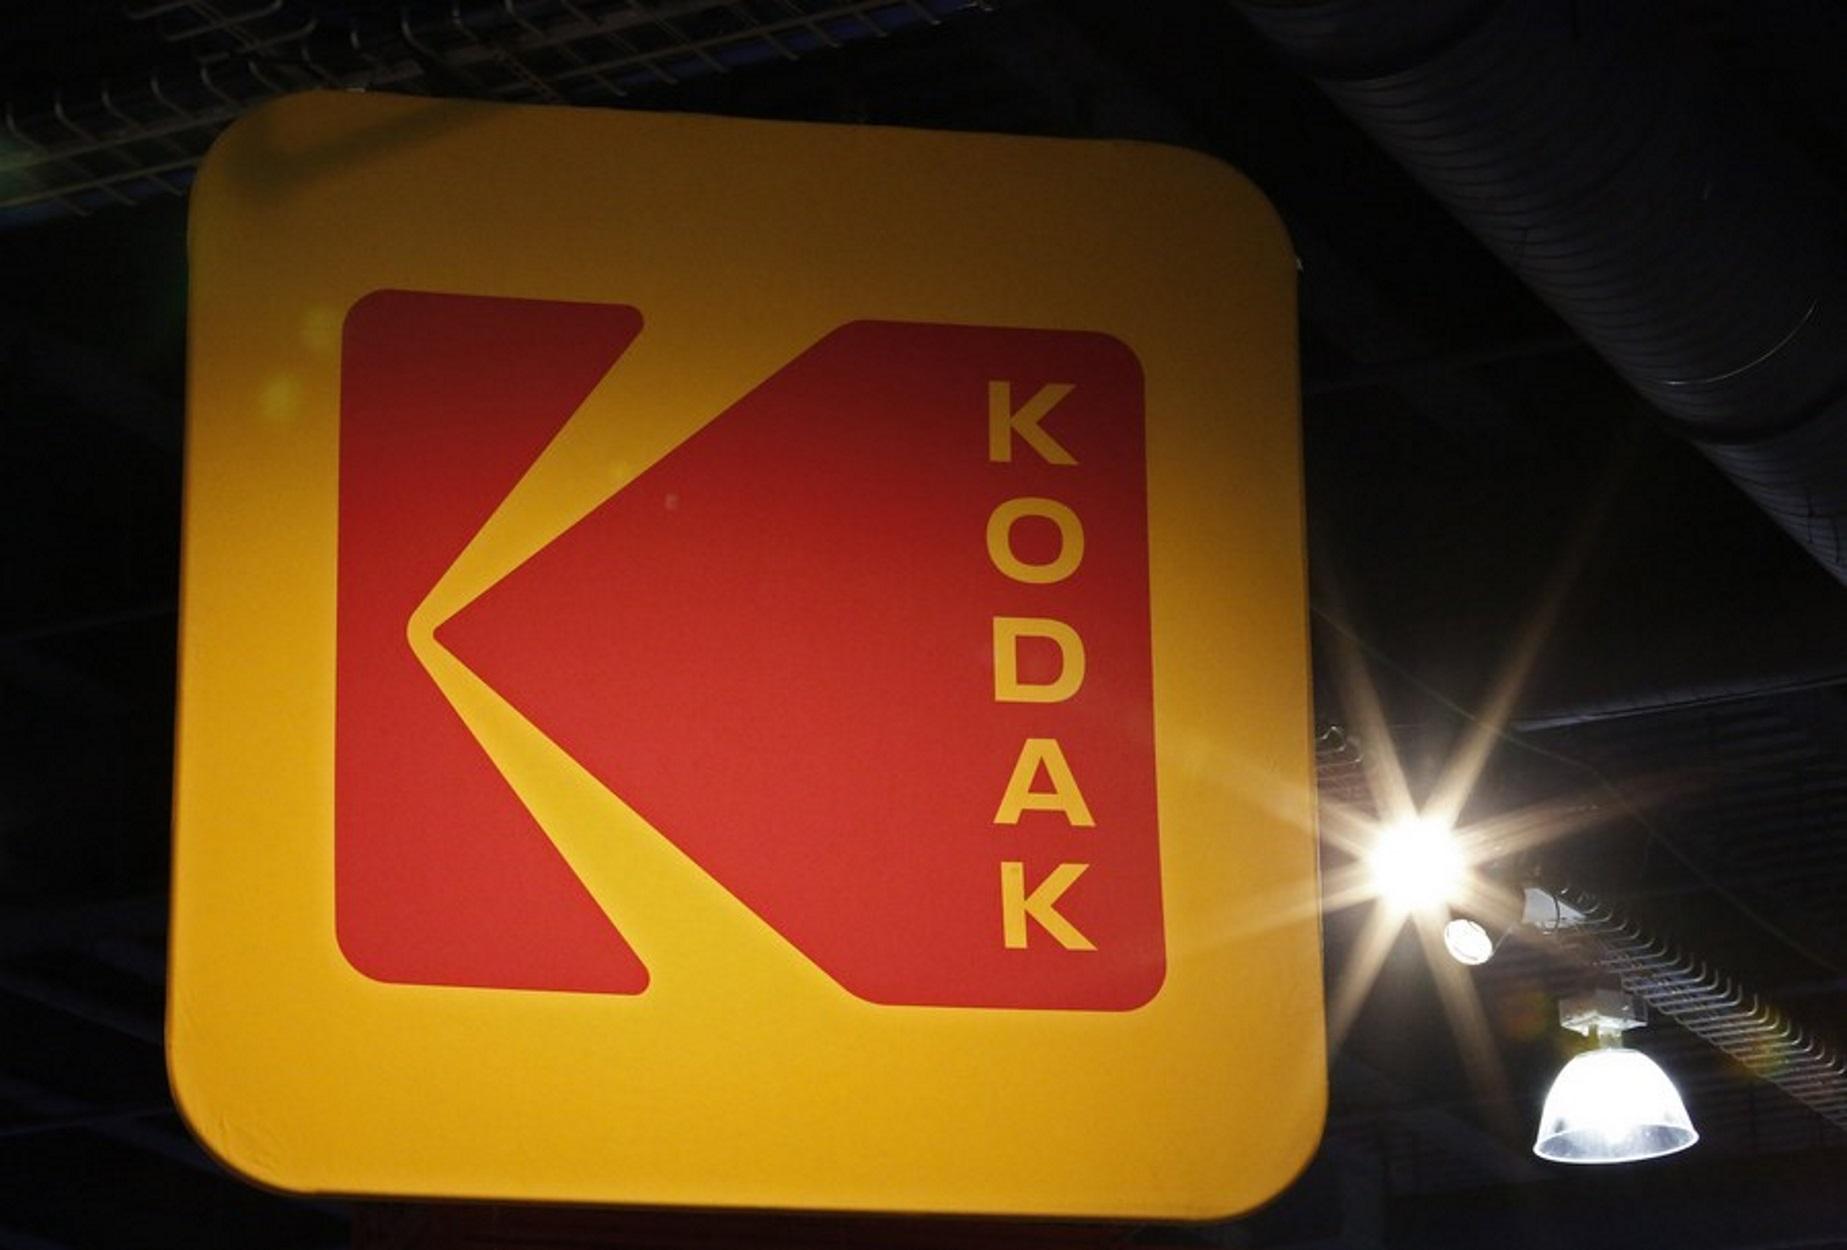 Kodak: Στροφή στην παραγωγή φαρμακευτικών ουσιών